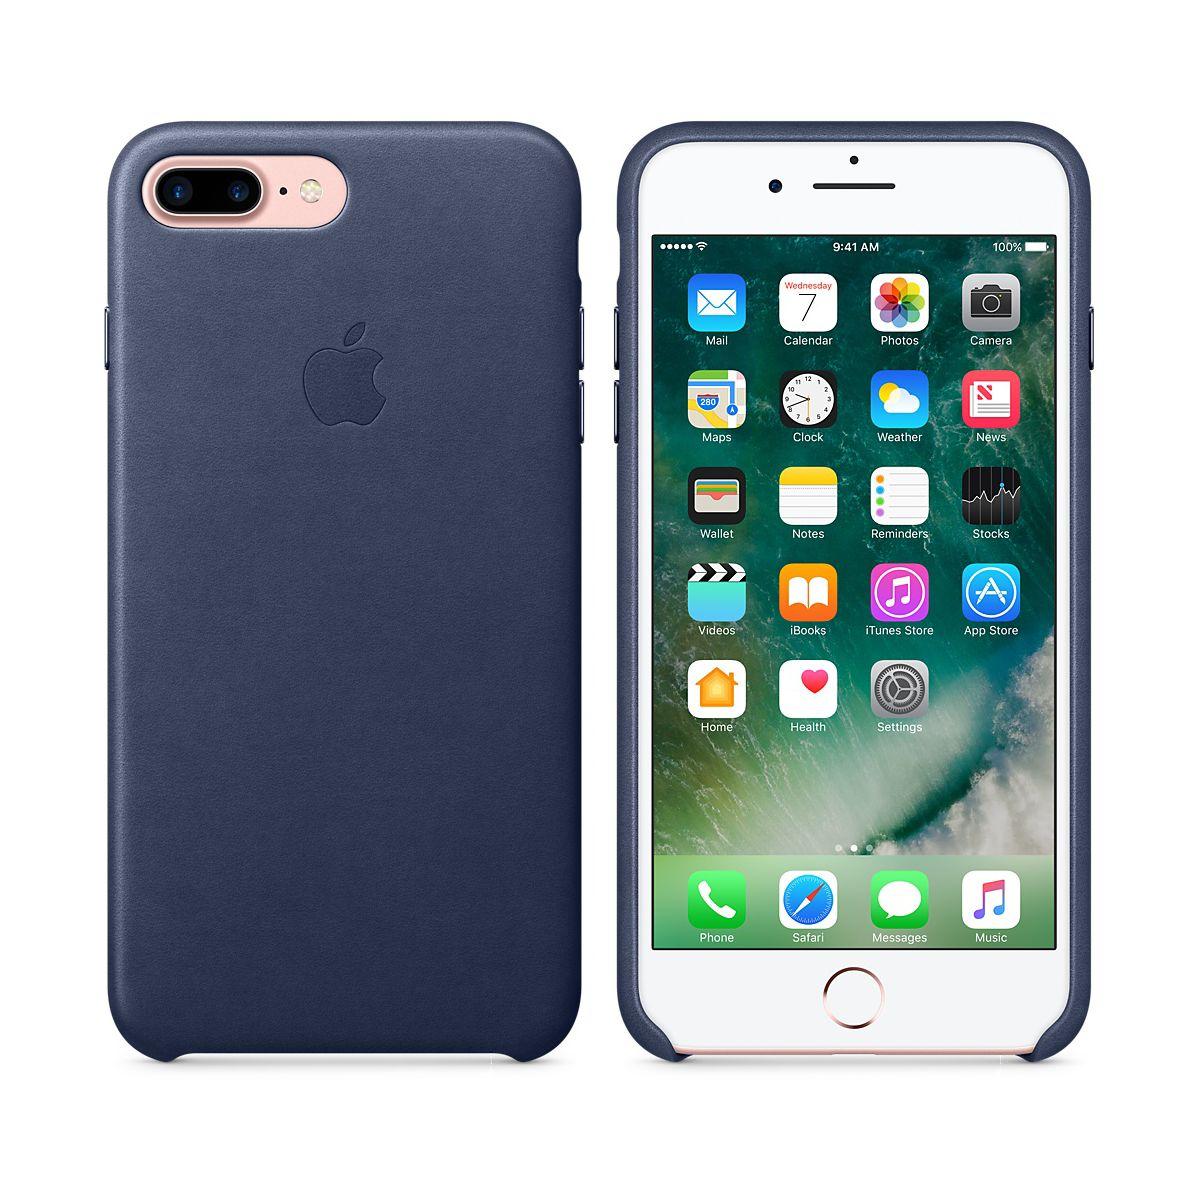 Coque APPLE iPhone 7 Plus cuir Bleu nuit (photo)